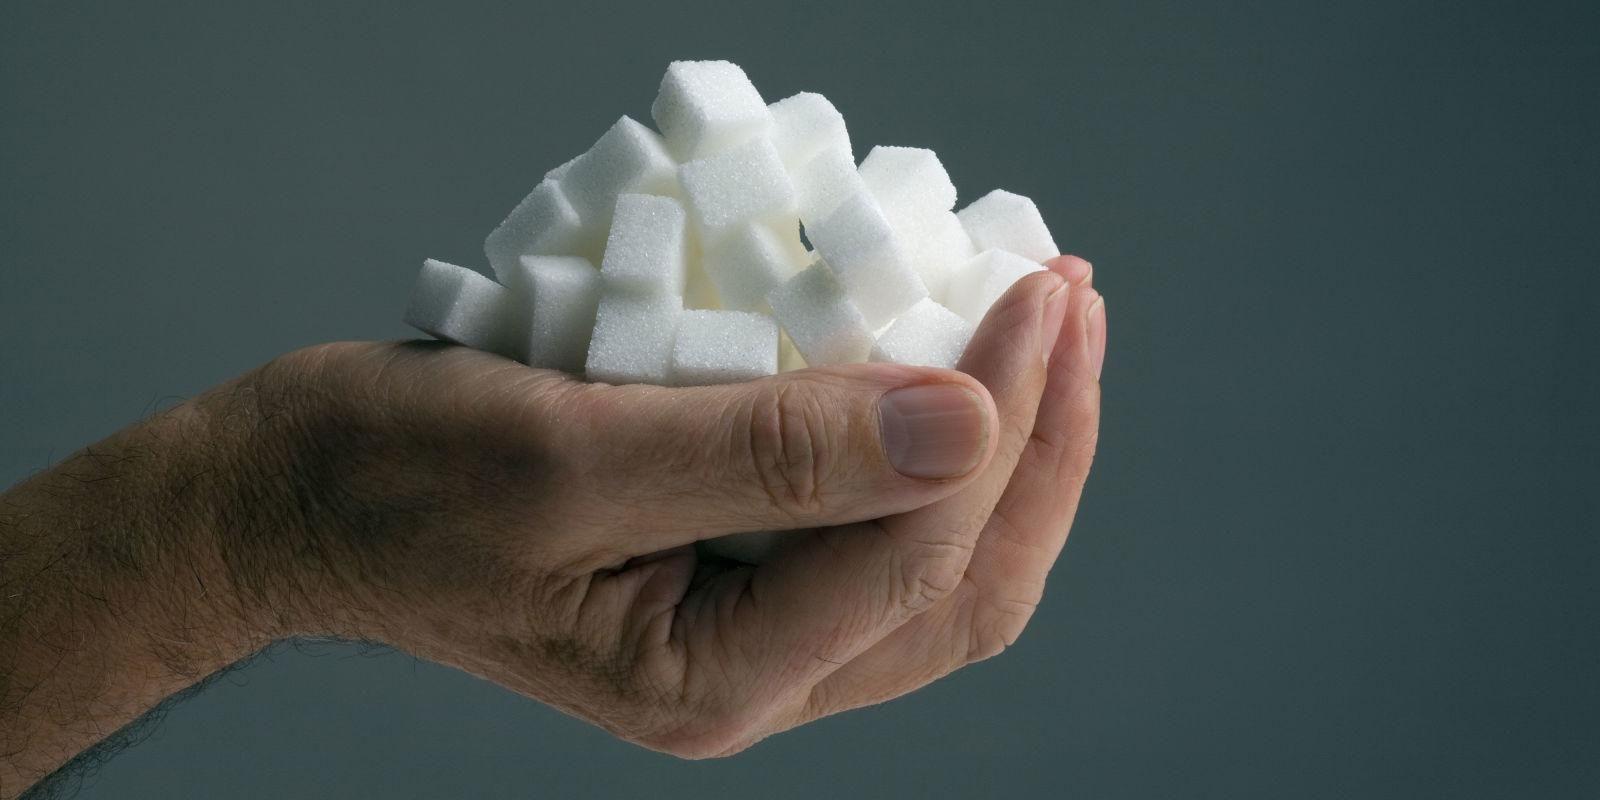 Can Diabetes Cause Boils